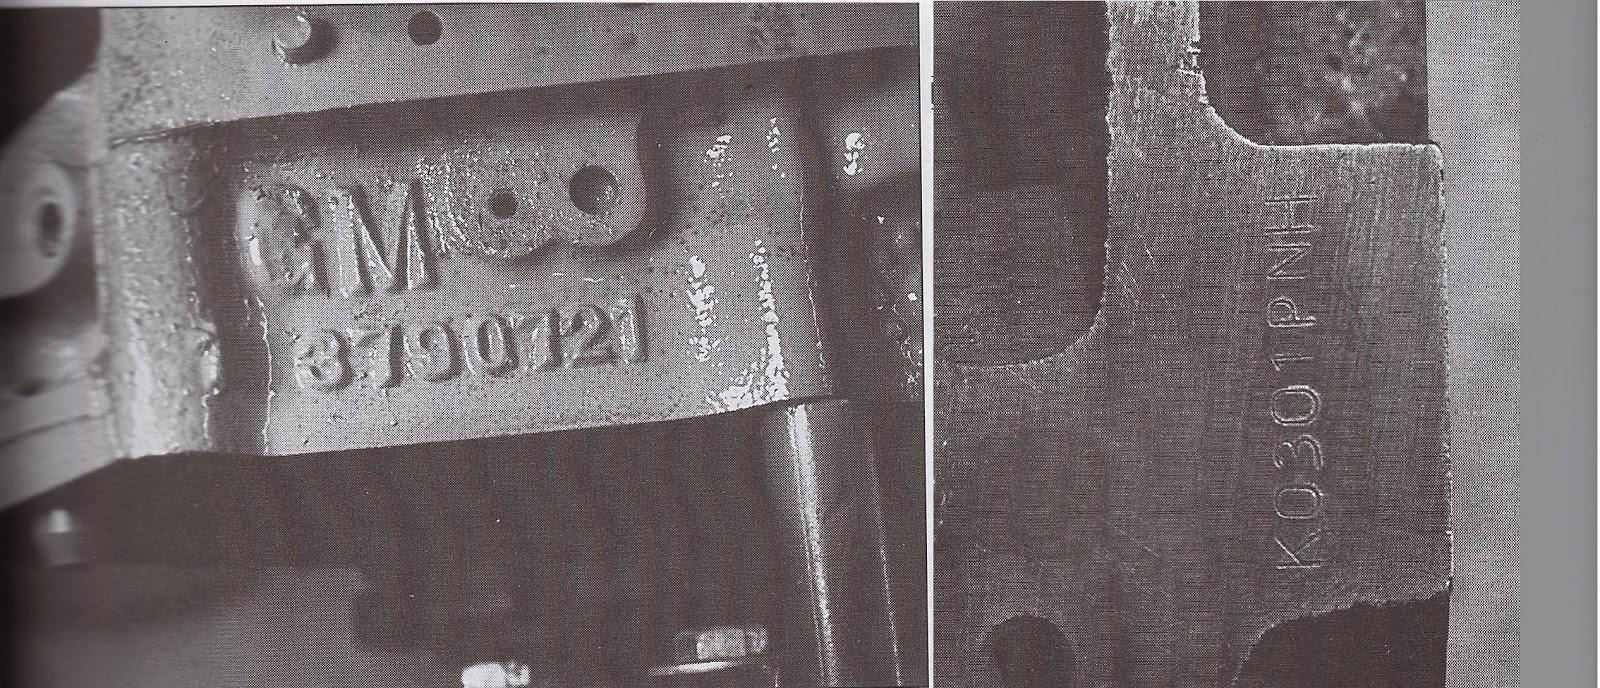 Block Casting Number on Mopar Engine Block Casting Numbers Location